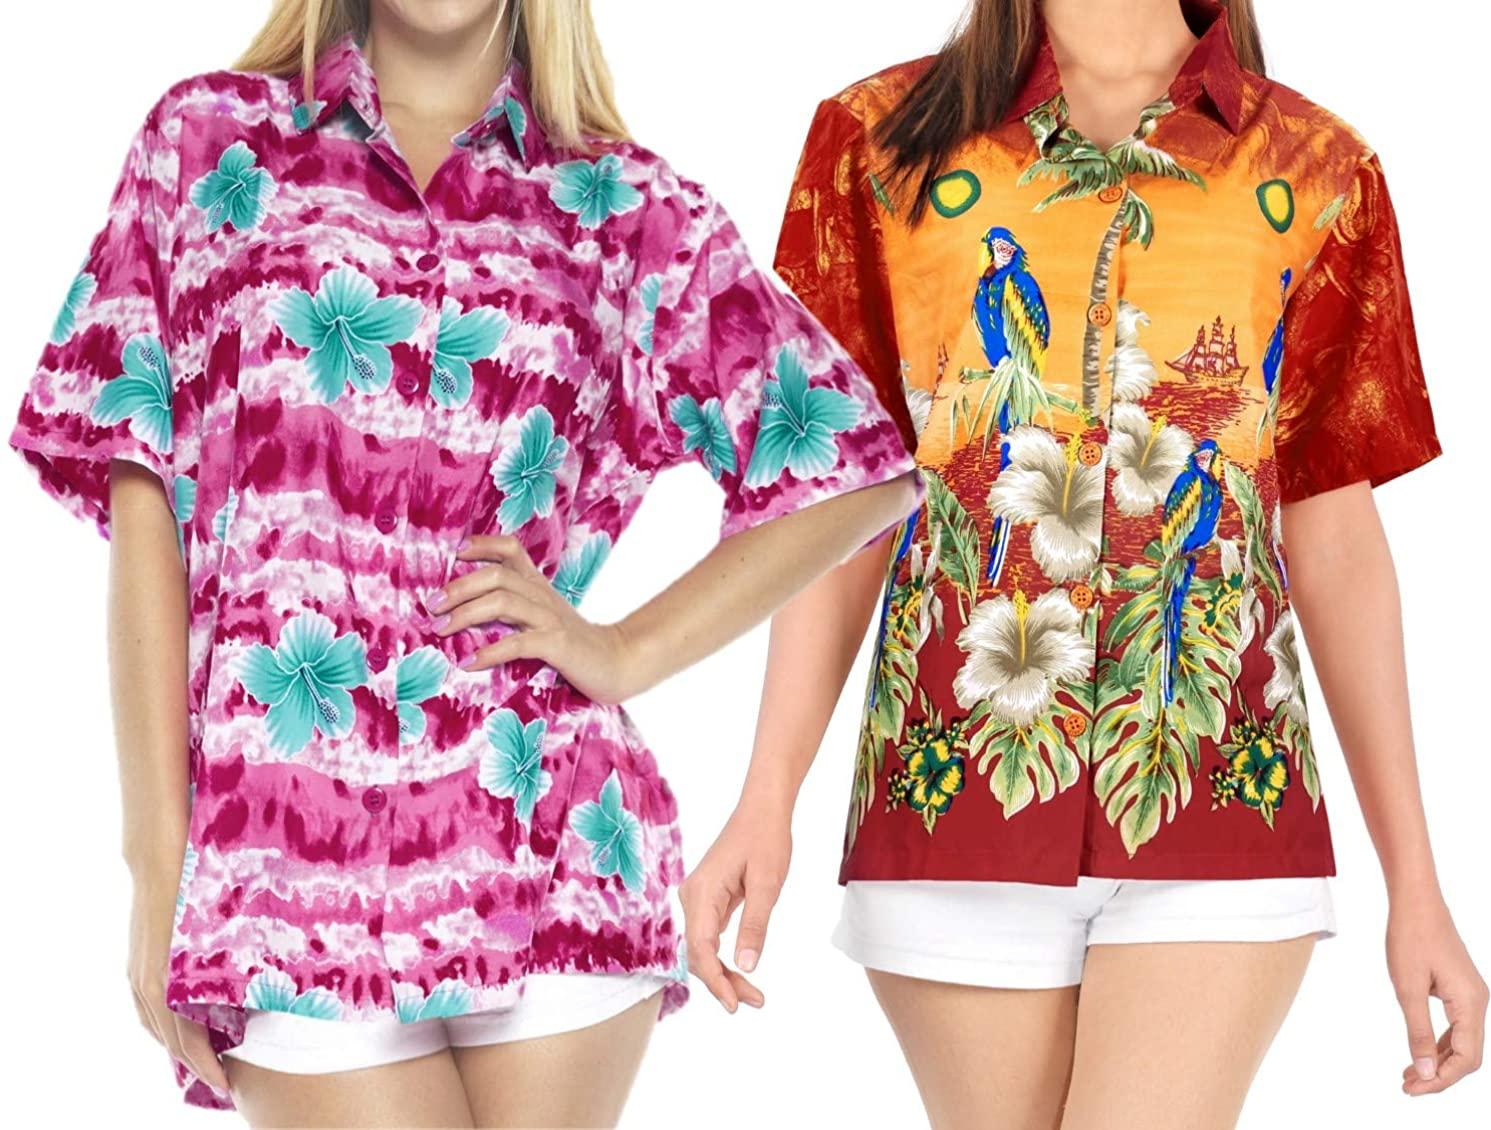 LA LEELA Women's Plus Size Hawaii Aloha Dress Shirt for Casual Wear Work from Home Clothes Women Beach Shirt Blouse Shirt Combo Pack of 2 Size M